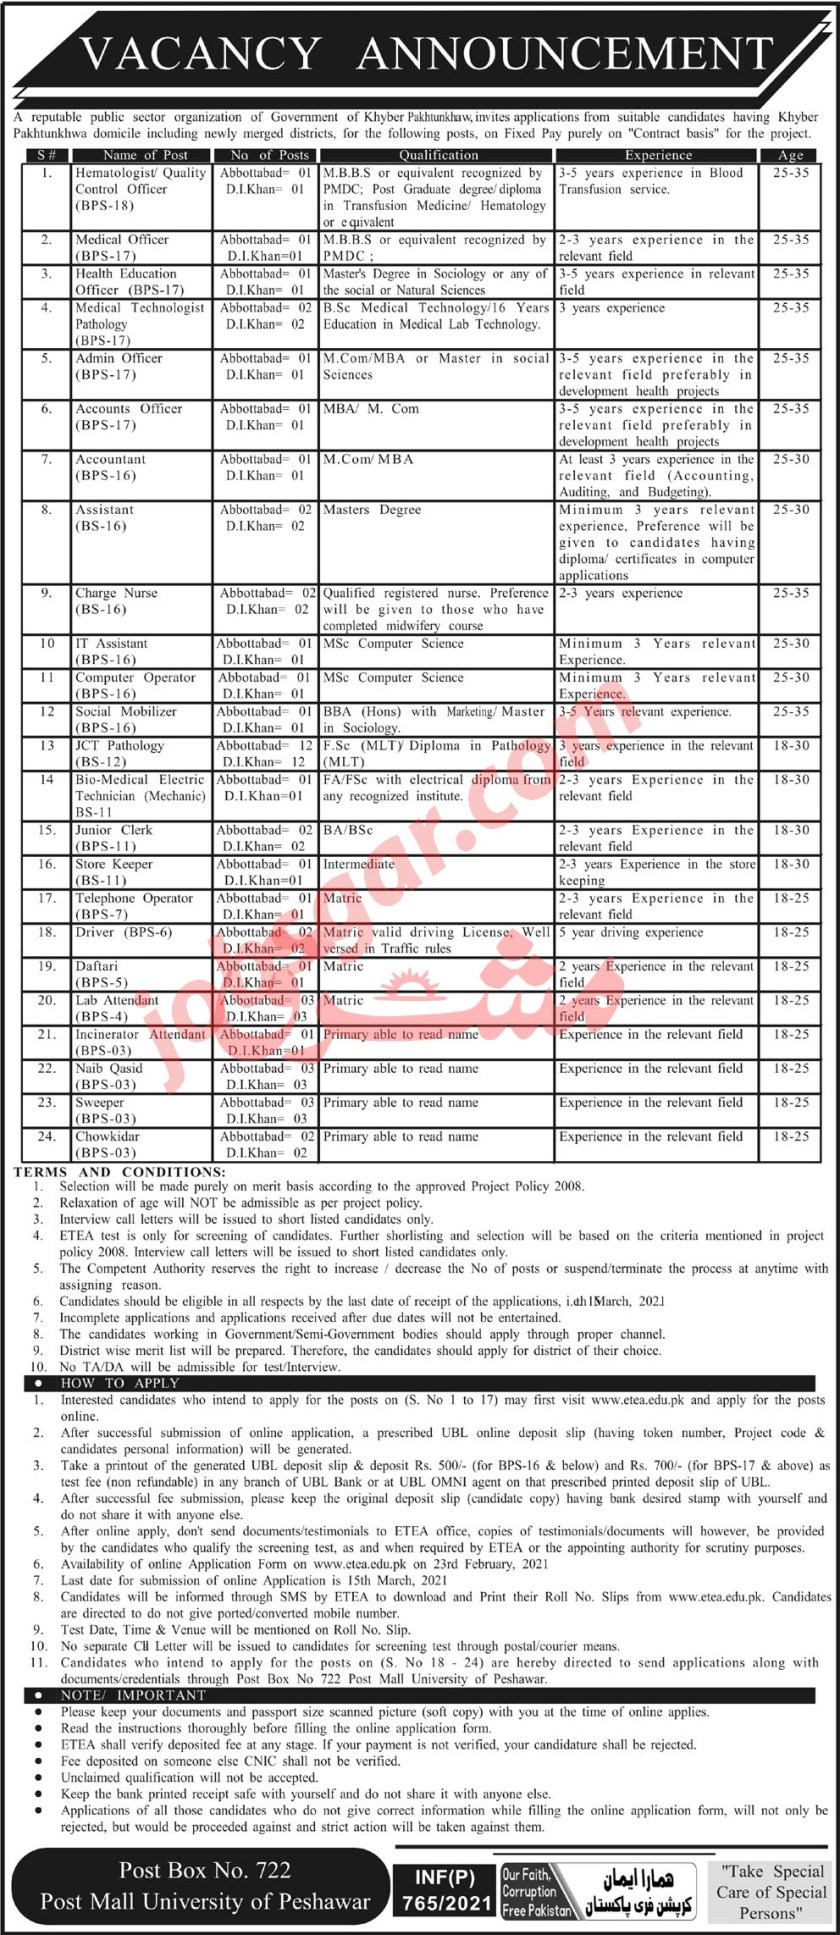 Public Sector Organization PO Box 722 Peshawar Jobs 2021